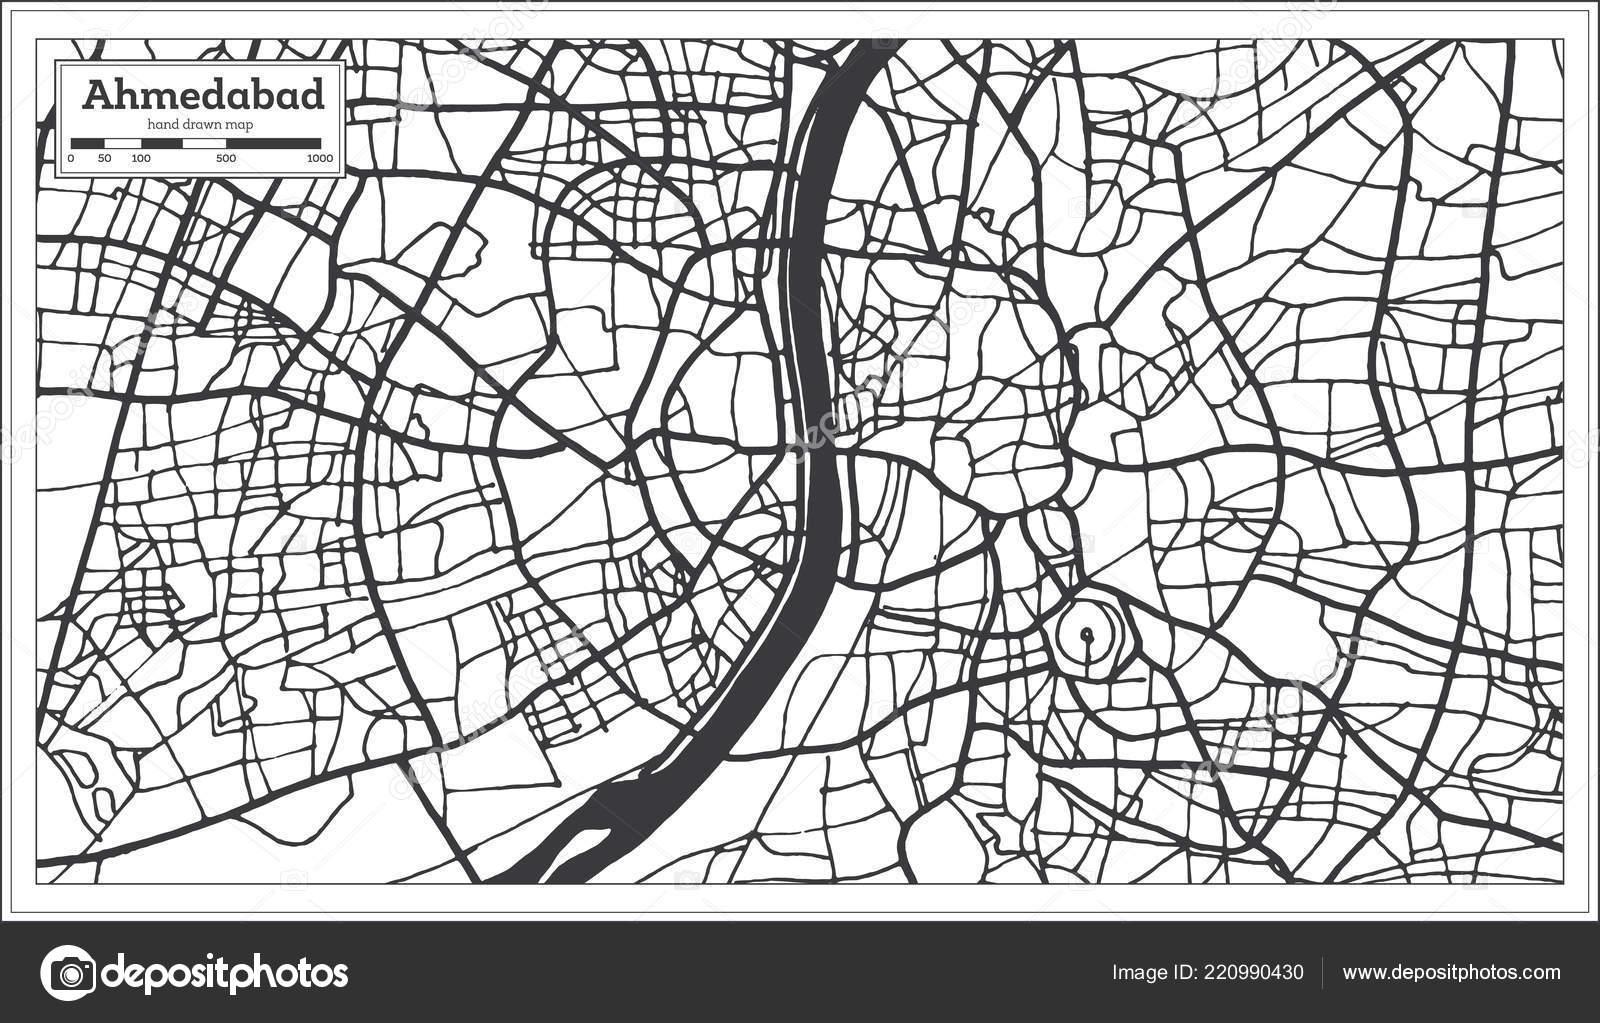 Carte Inde Ahmedabad.Carte Ville Ahmedabad Inde Dans Style Retro Carte Muette